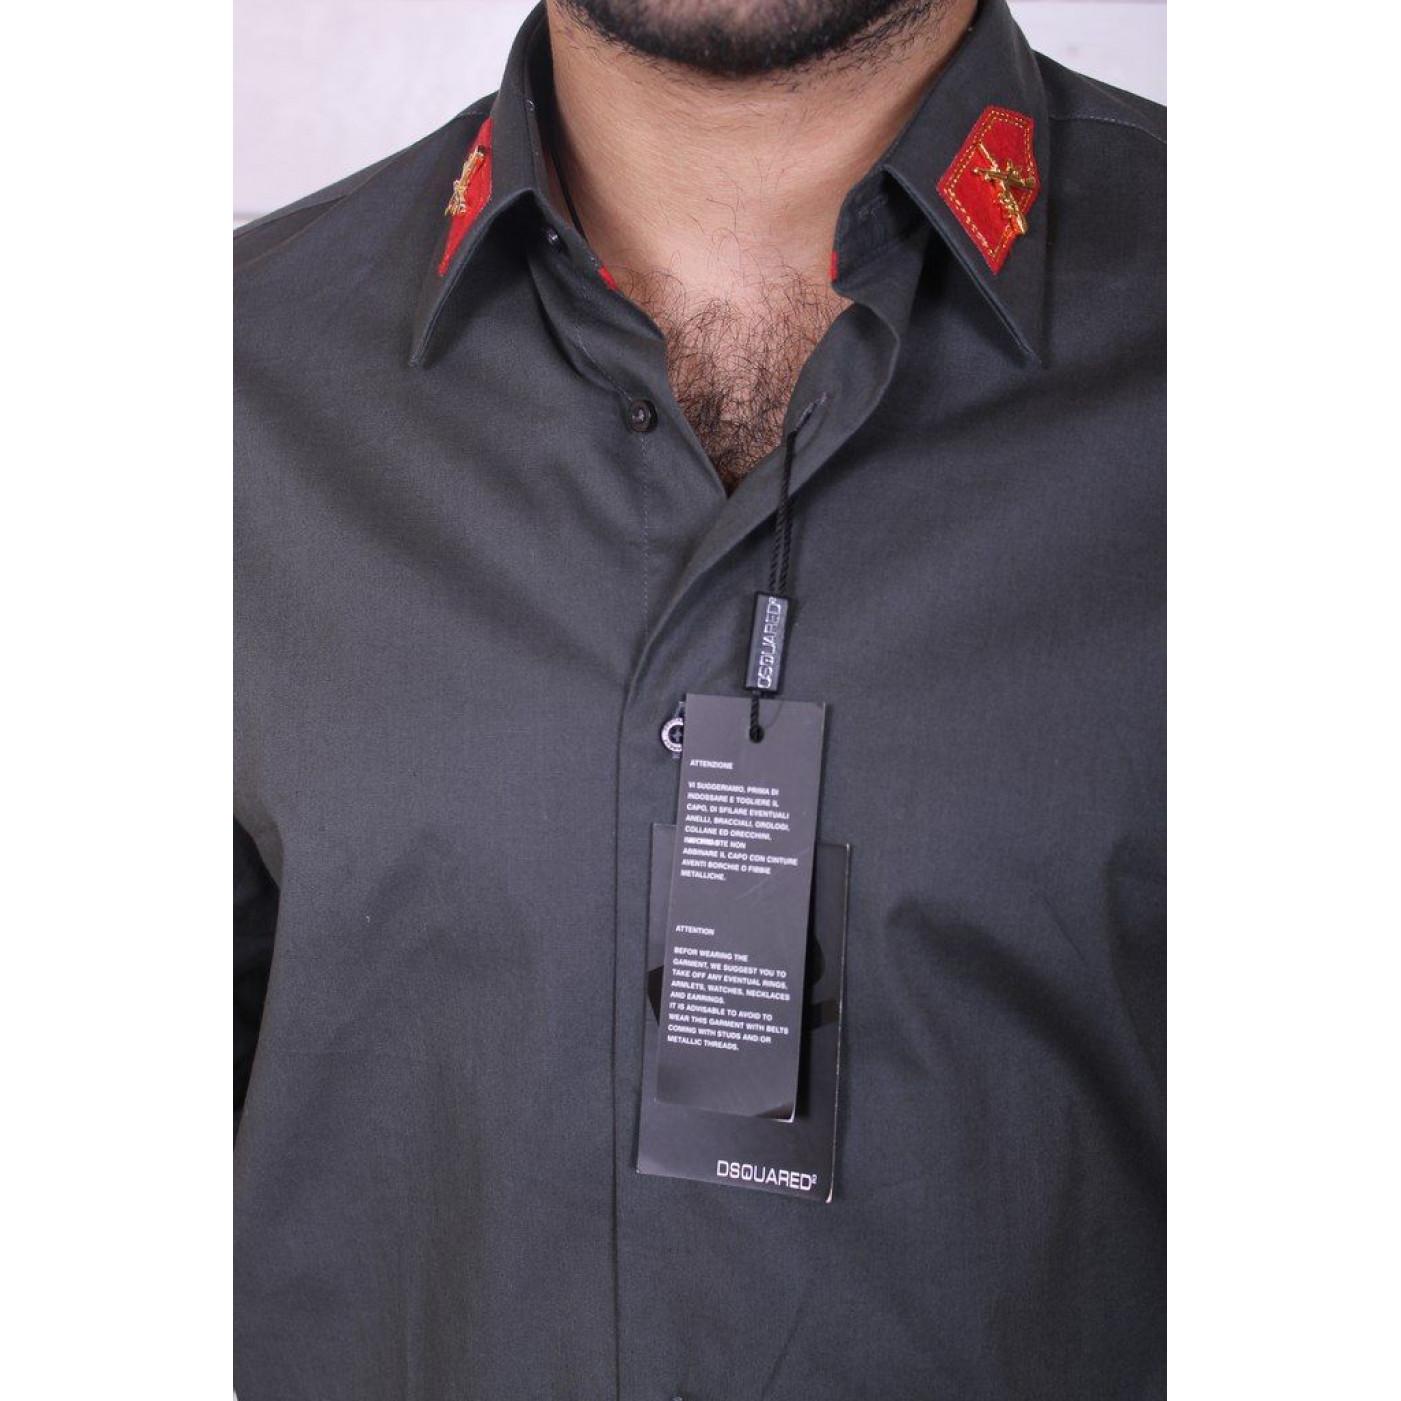 Рубашка темно-серая с погонами на воротнике 7063